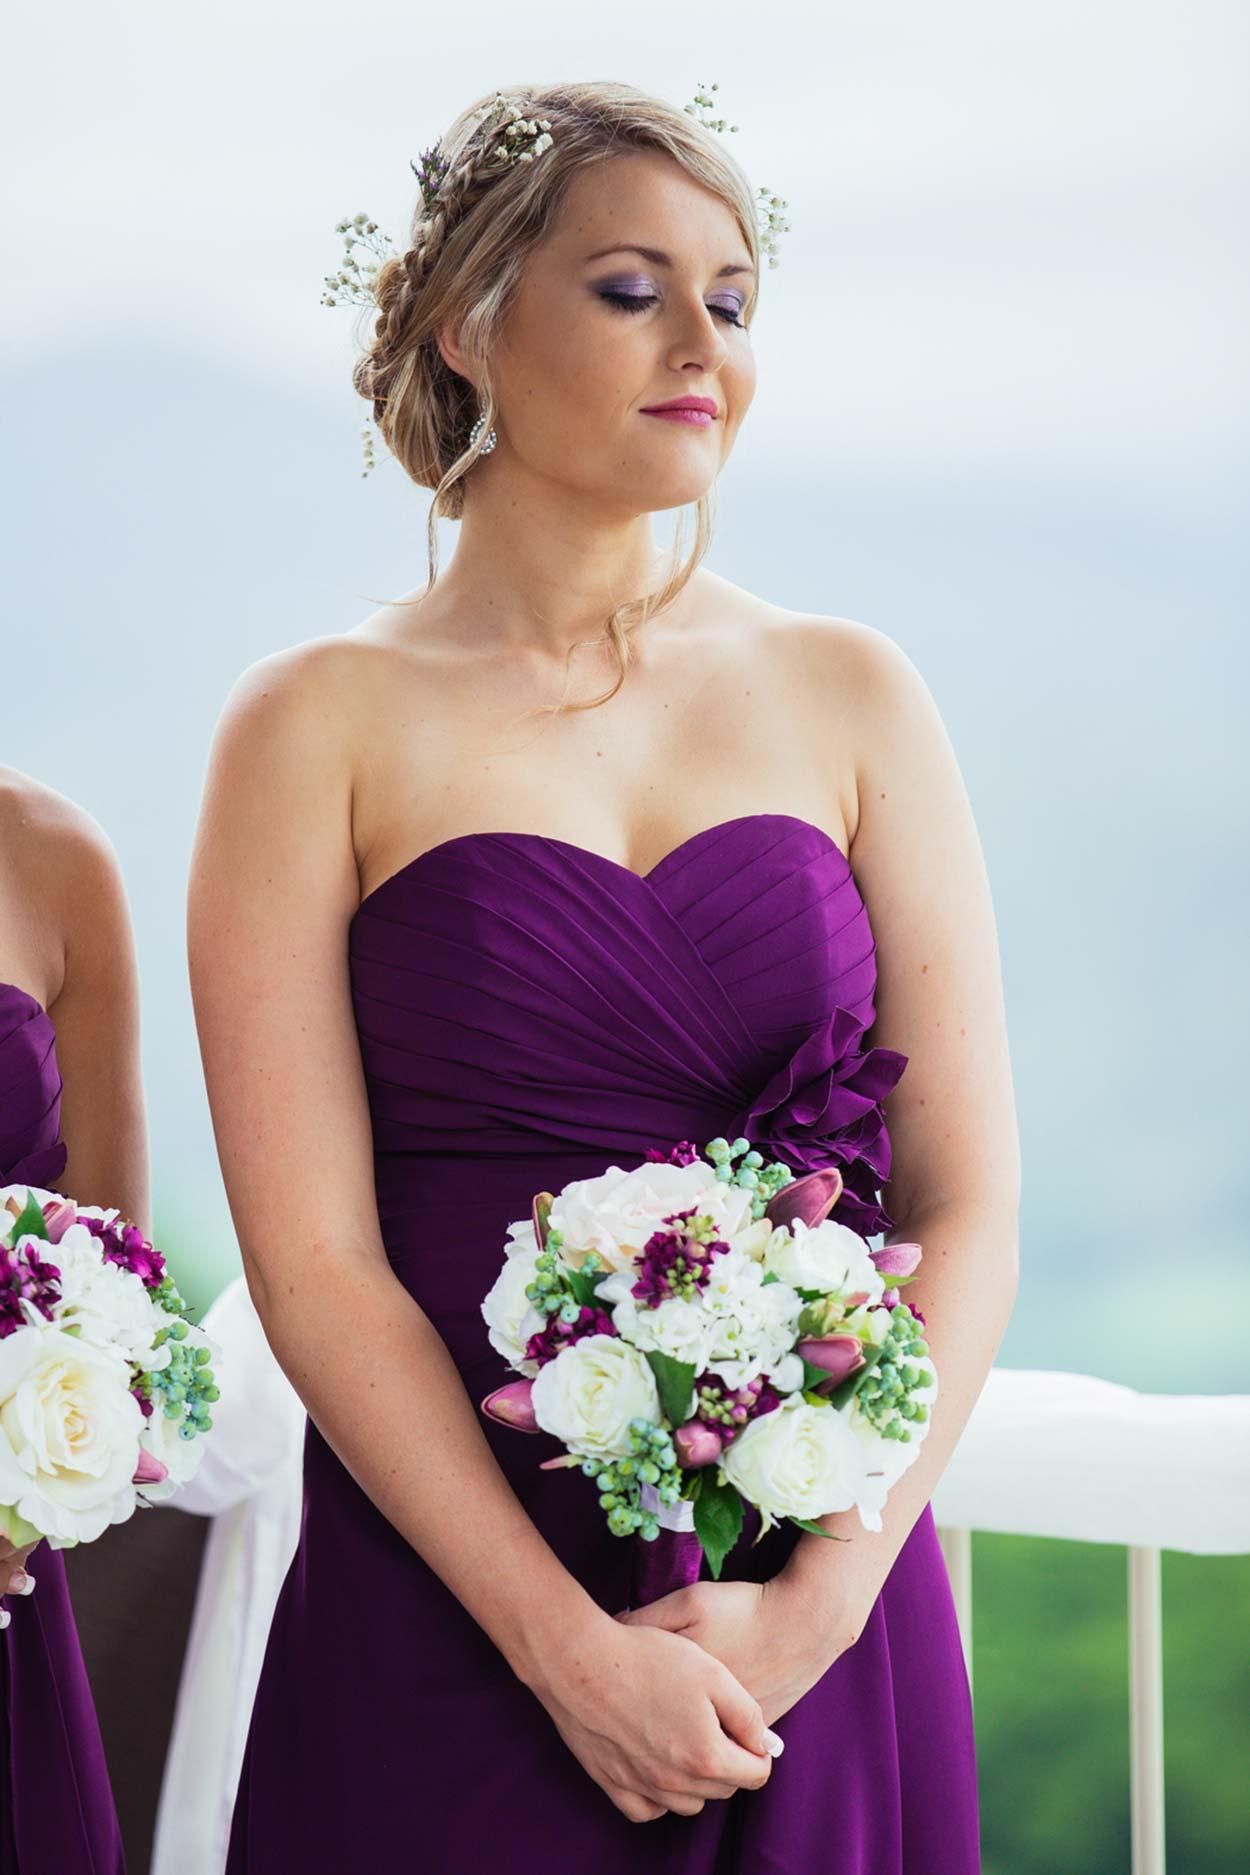 sunshine-coast-destination-wedding-photographers-brisbane-queensland-australian-maleny-noosa-beach-hinterland-montville-flaxton-gold-caloundra-elopement-photos-best-recommended-eco-friendly-packages-59.jpg